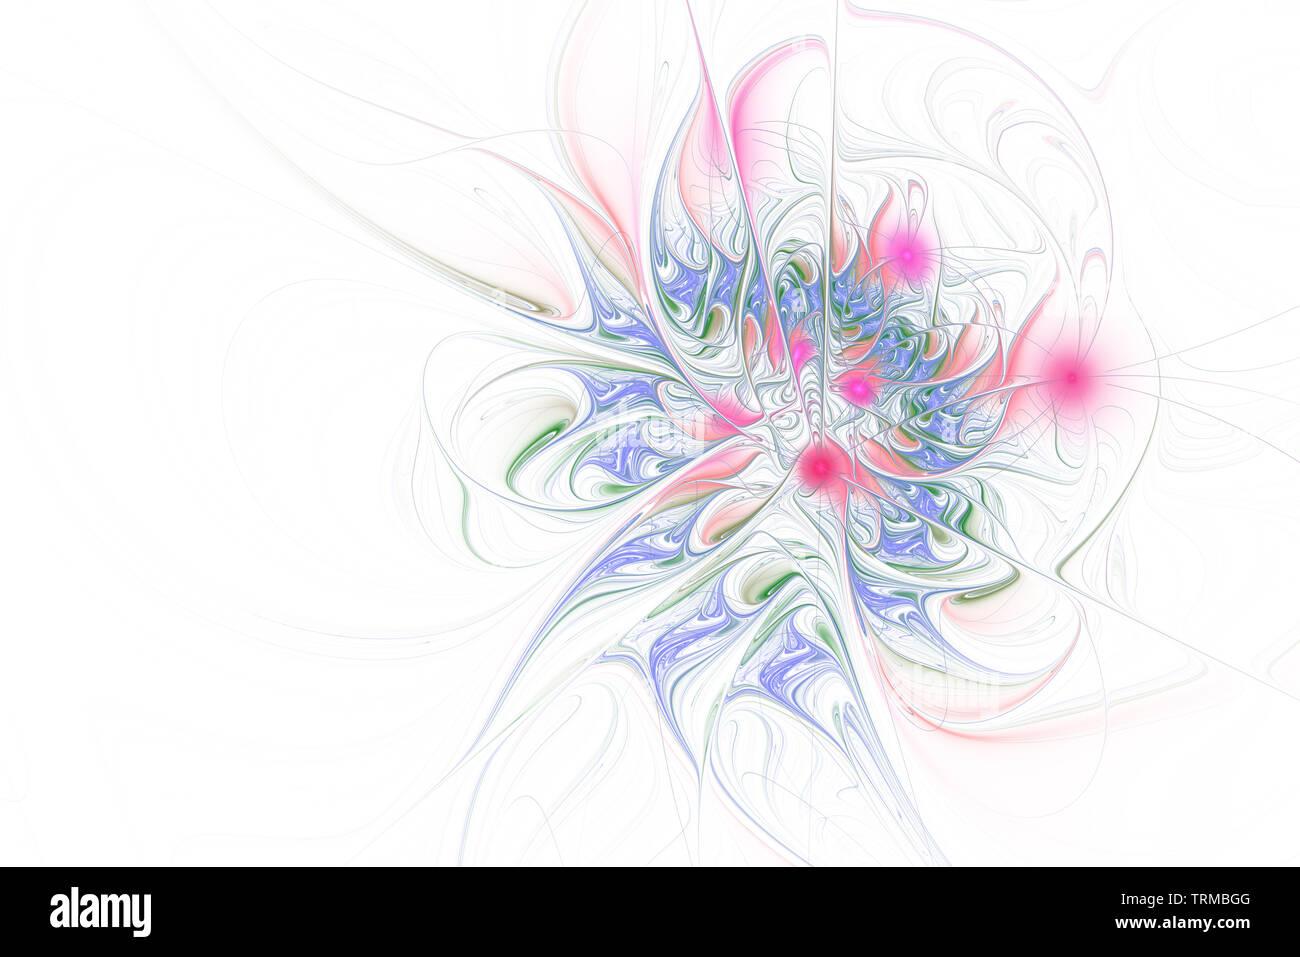 Fractal illustration of bright background with floral ornament. Creative element for design. Fractal flower rendered by math algorithm. Digital artwor Stock Photo